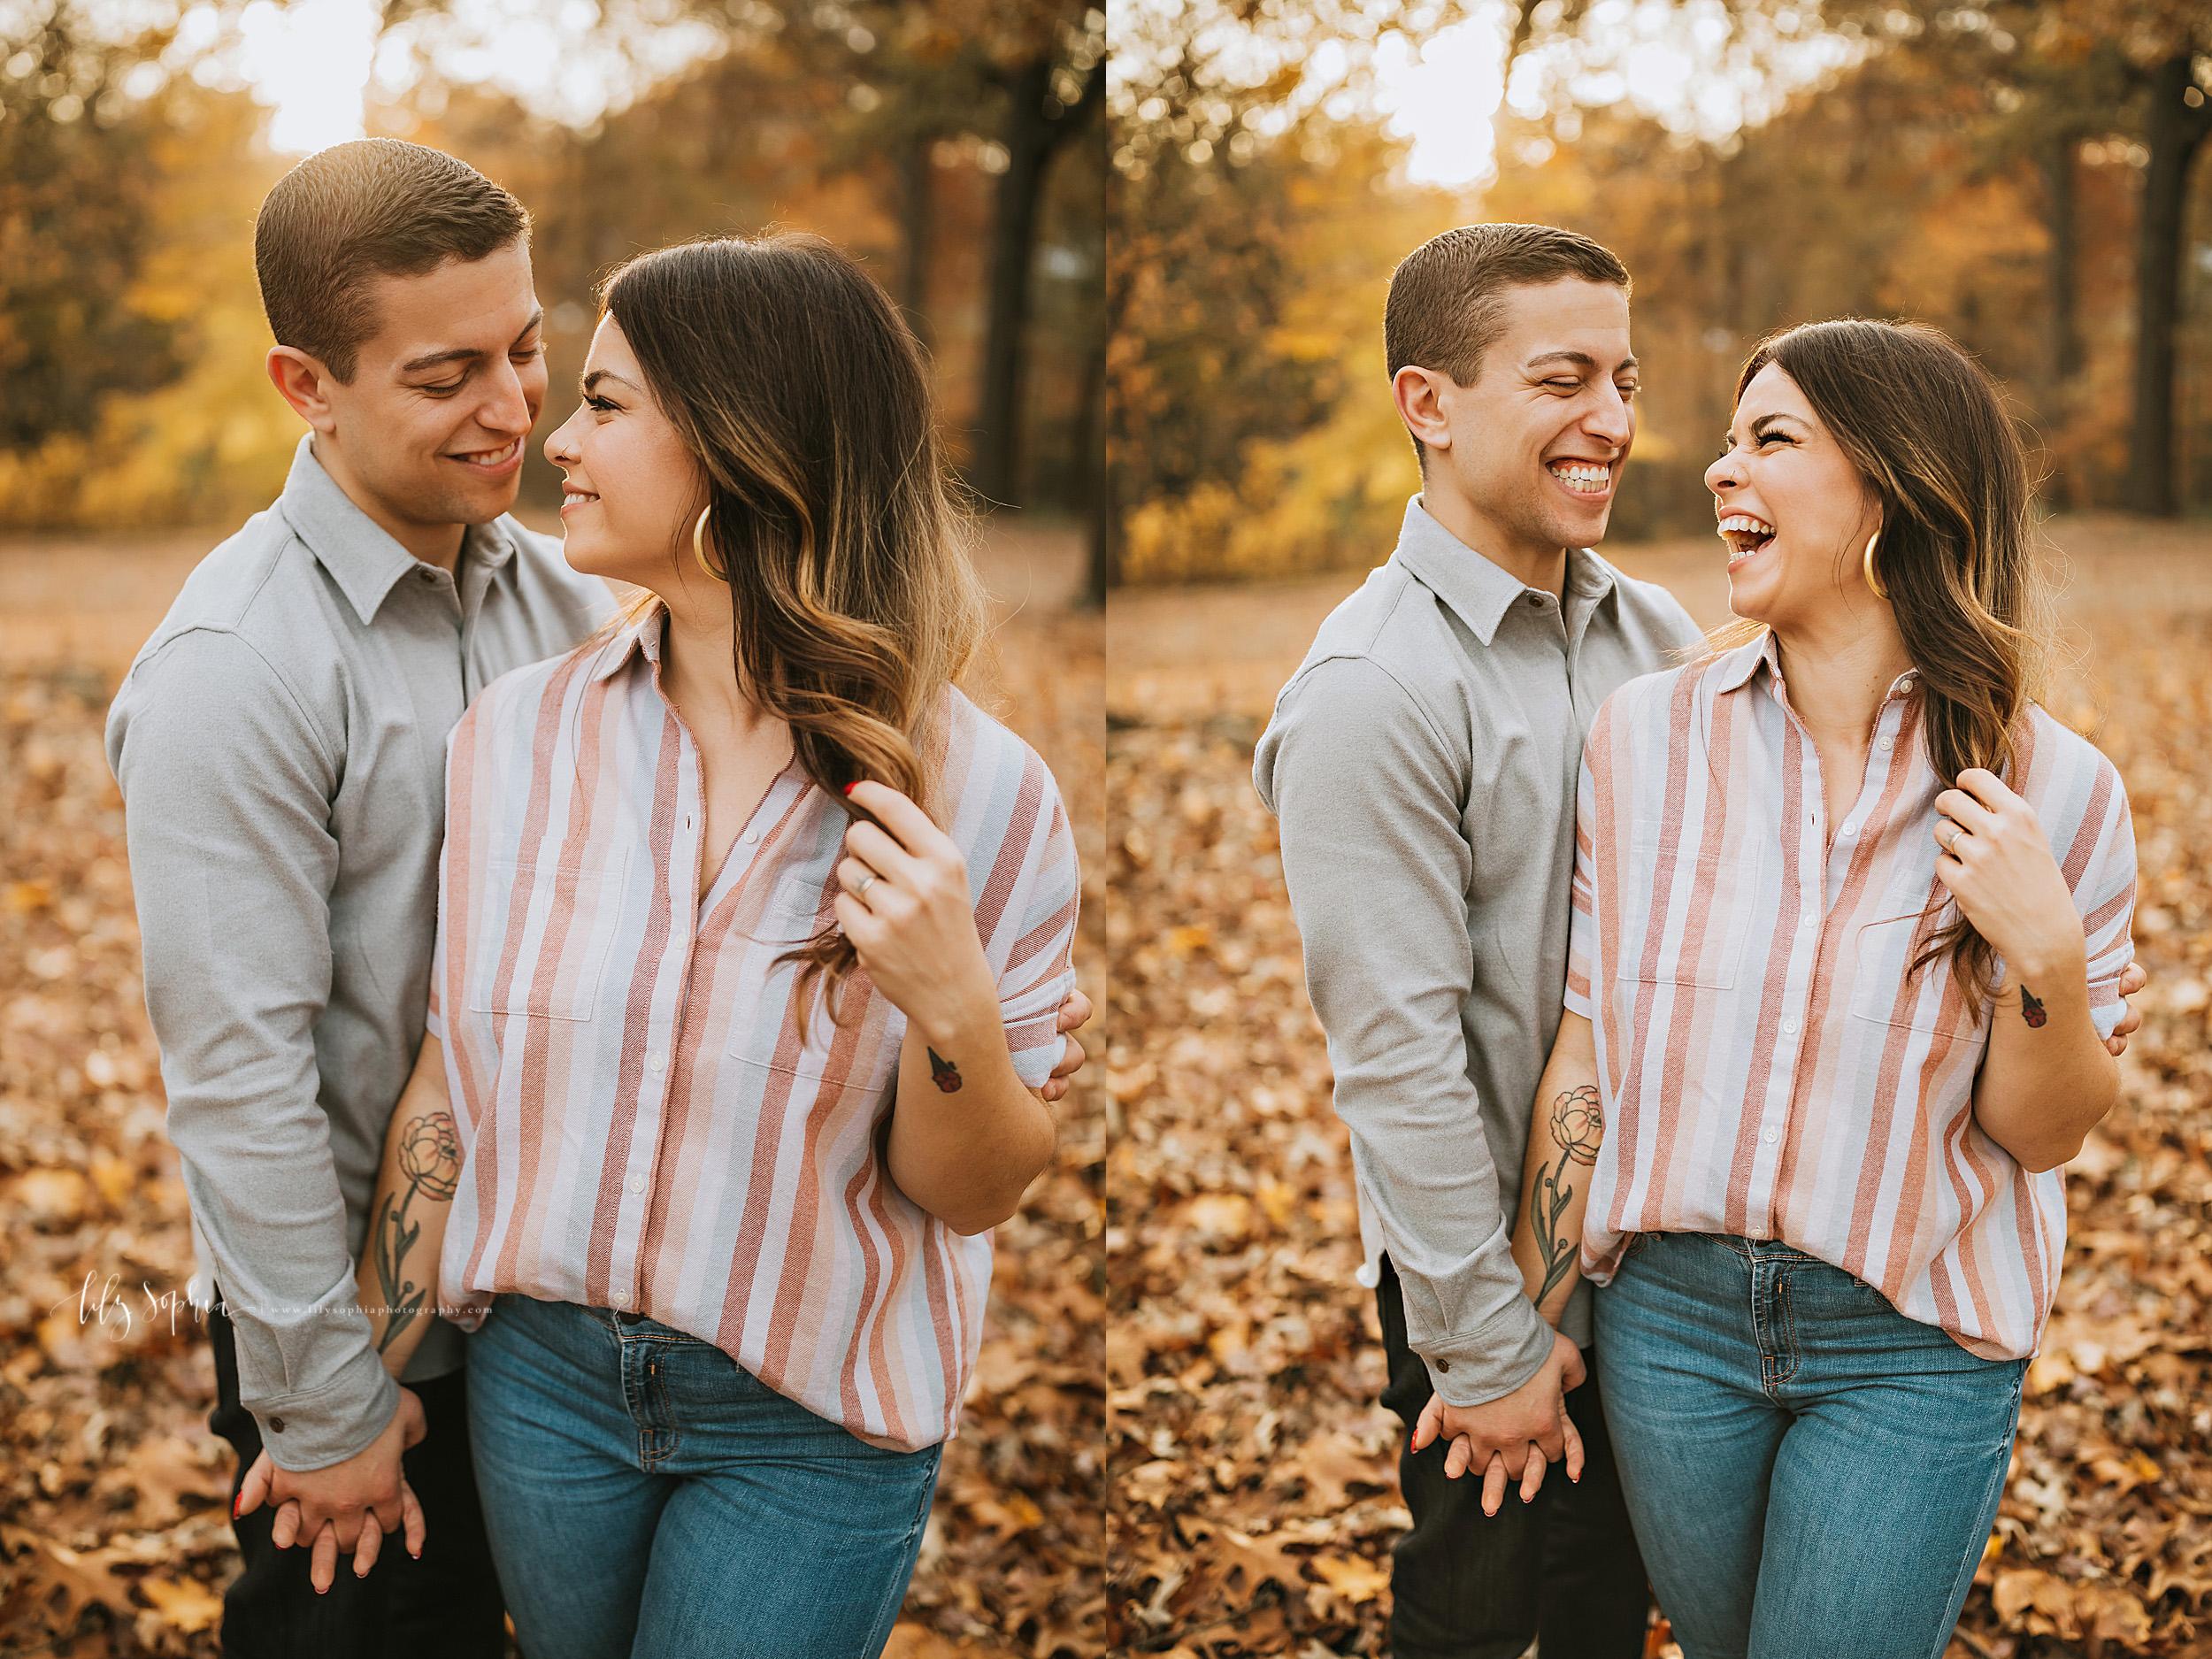 atlanta-reynoldstown-peoplestown-decatur-sandy-springs-buckhead-virginia-highlands-west-end-decatur-lily-sophia-photography-outdoor-fall-couples-photos_1479.jpg